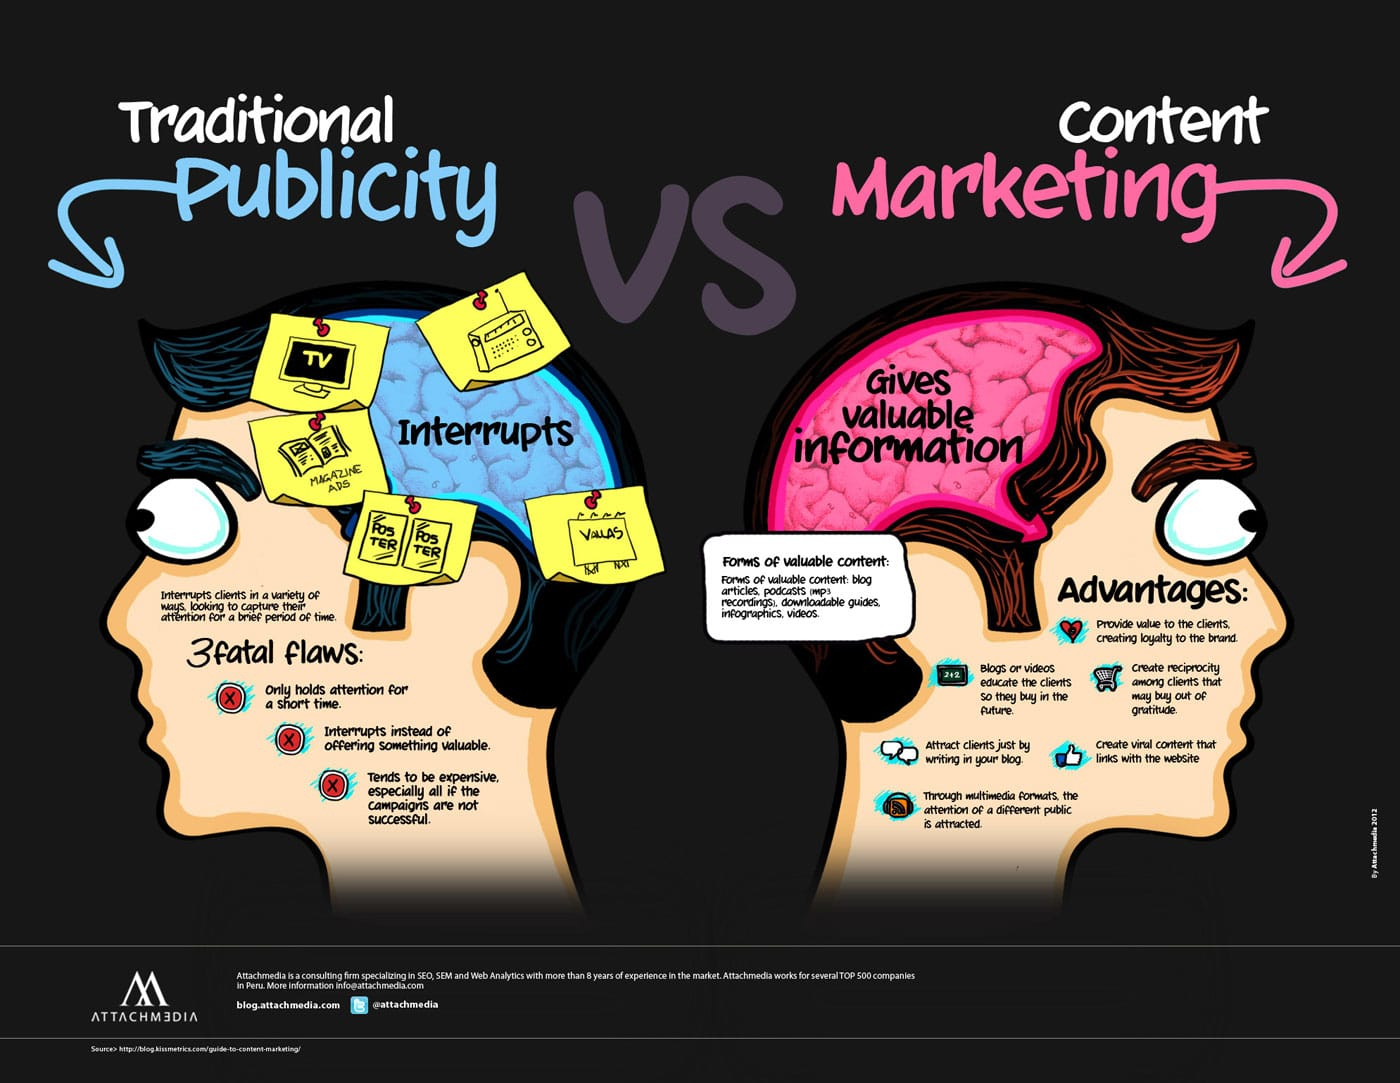 https://i1.wp.com/www.bitrebels.com/wp-content/uploads/2013/04/content-marketing-traditional-marketing-chart.jpg